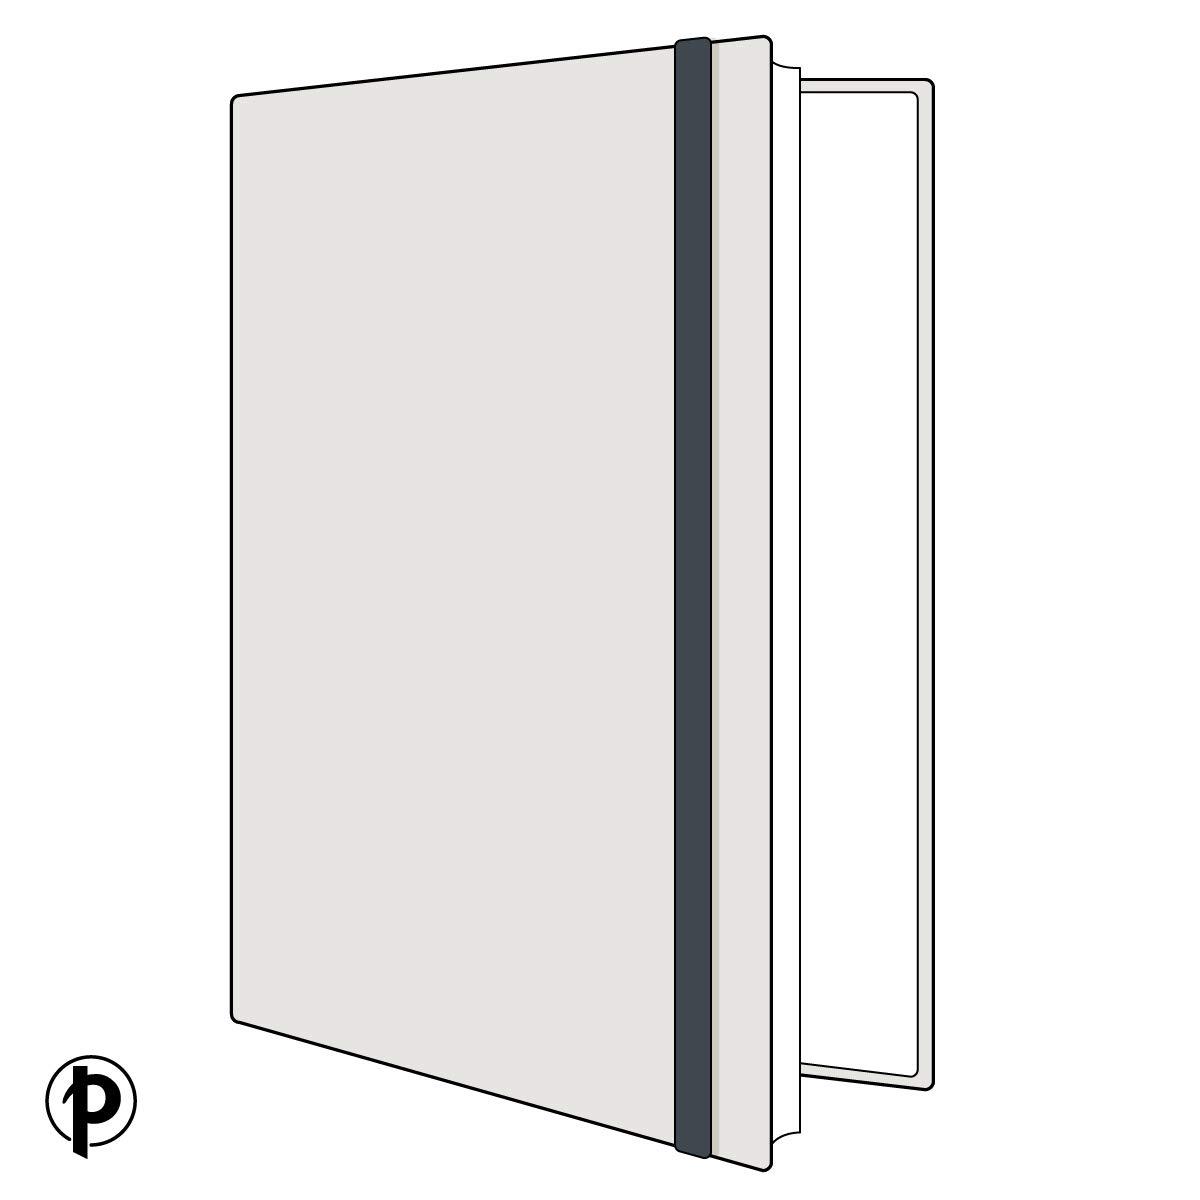 Urban Glam Schlicht |Verso Paperblanks 12-Monatskalender 2020 Ultra 230 x 180 mm